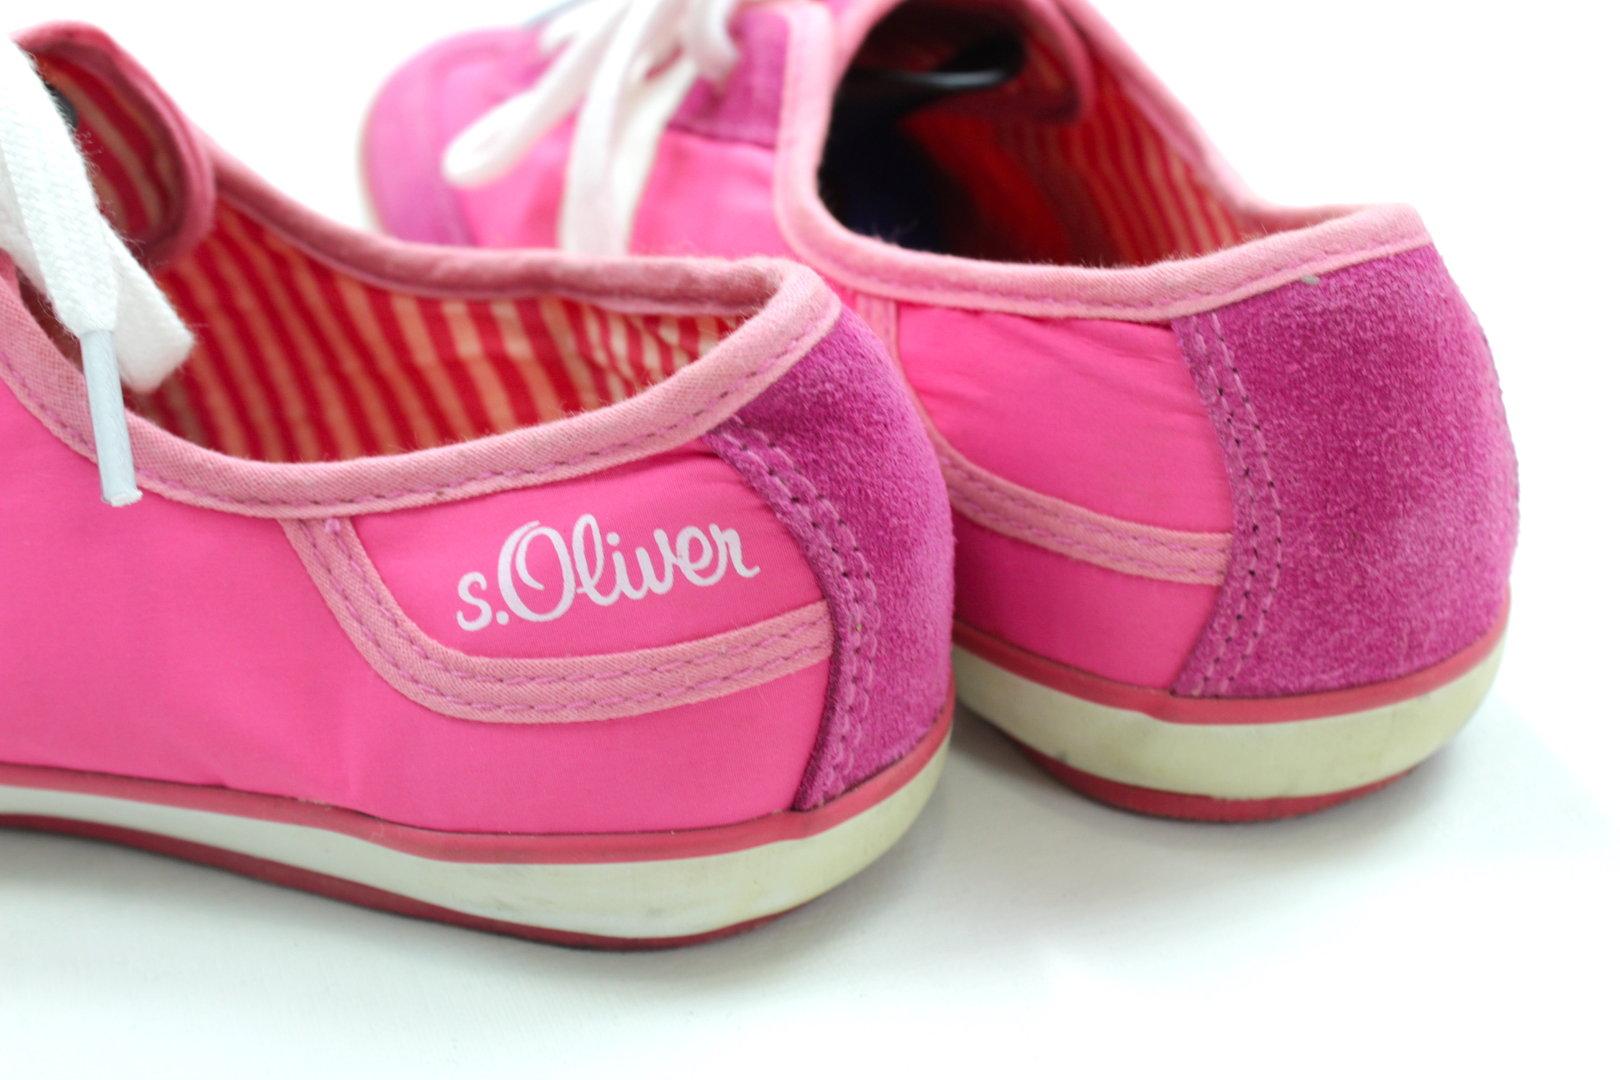 S.OLIVER Sneaker Halbschuhe Schnürer Damen rosa 38